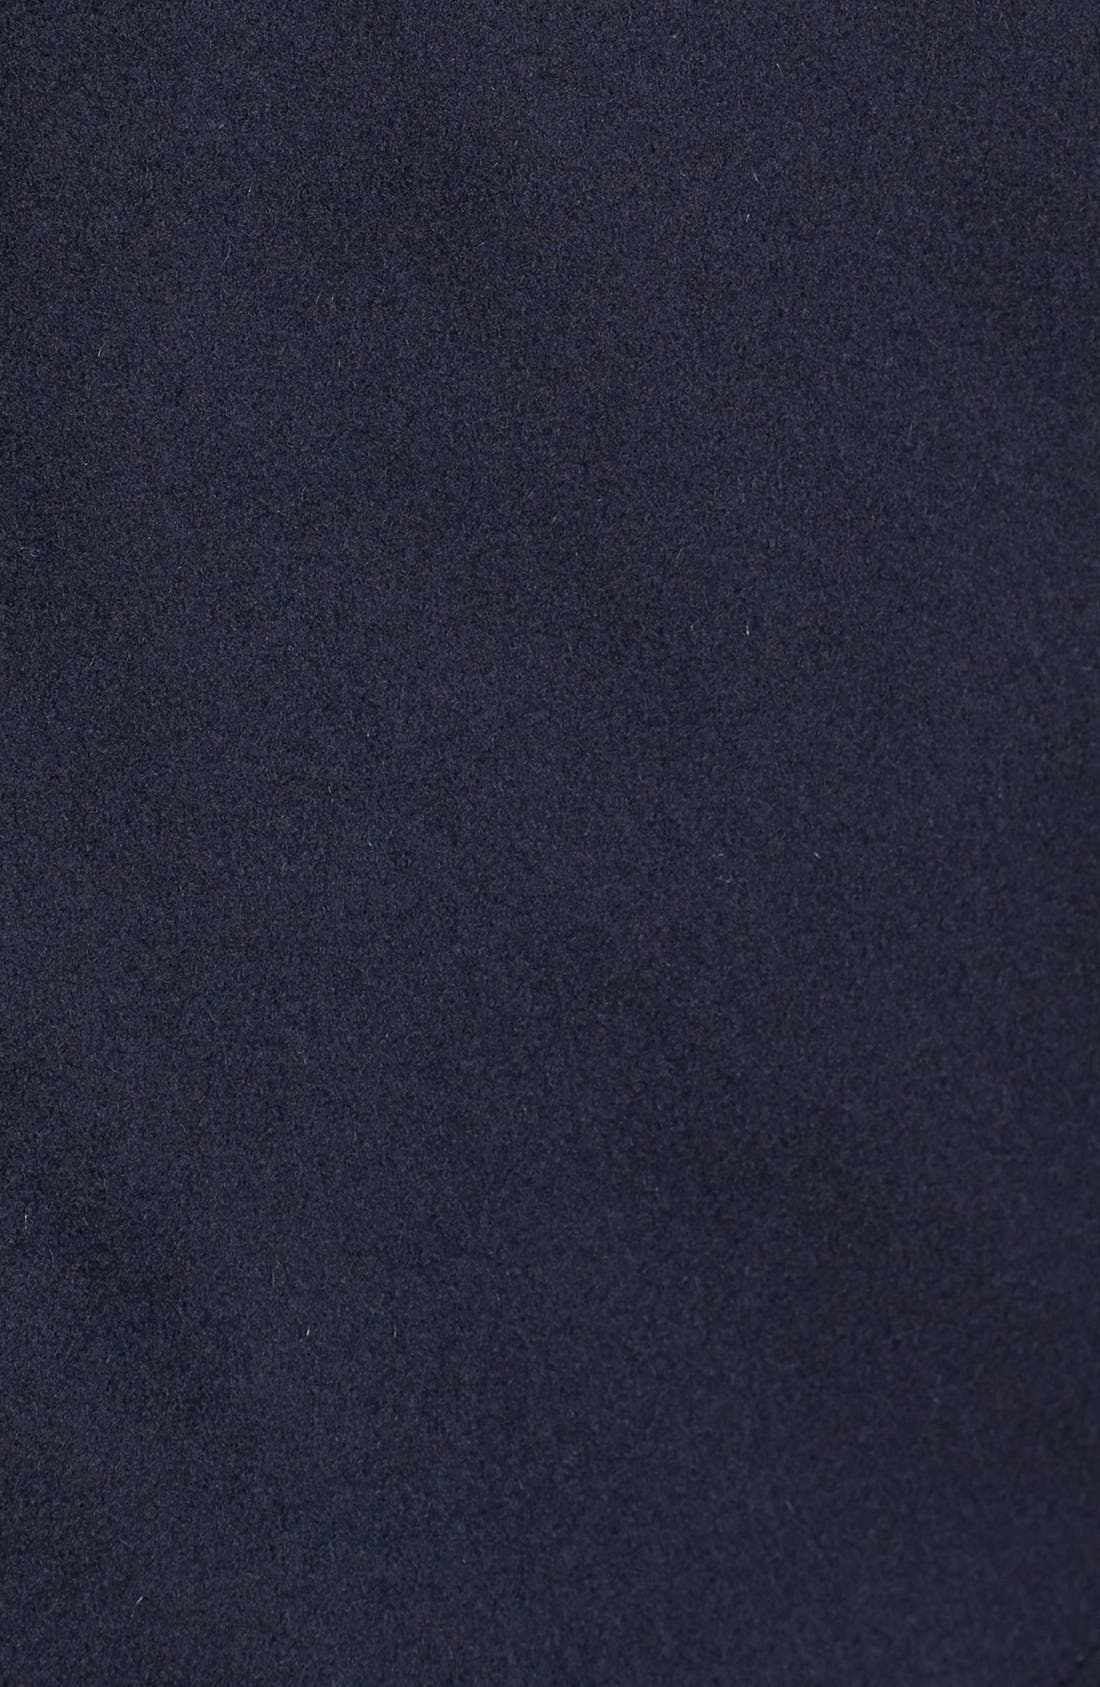 ZZDNUHUGO BOSS,                             BOSS HUGO BOSS 'Logan' Topcoat,                             Alternate thumbnail 3, color,                             403